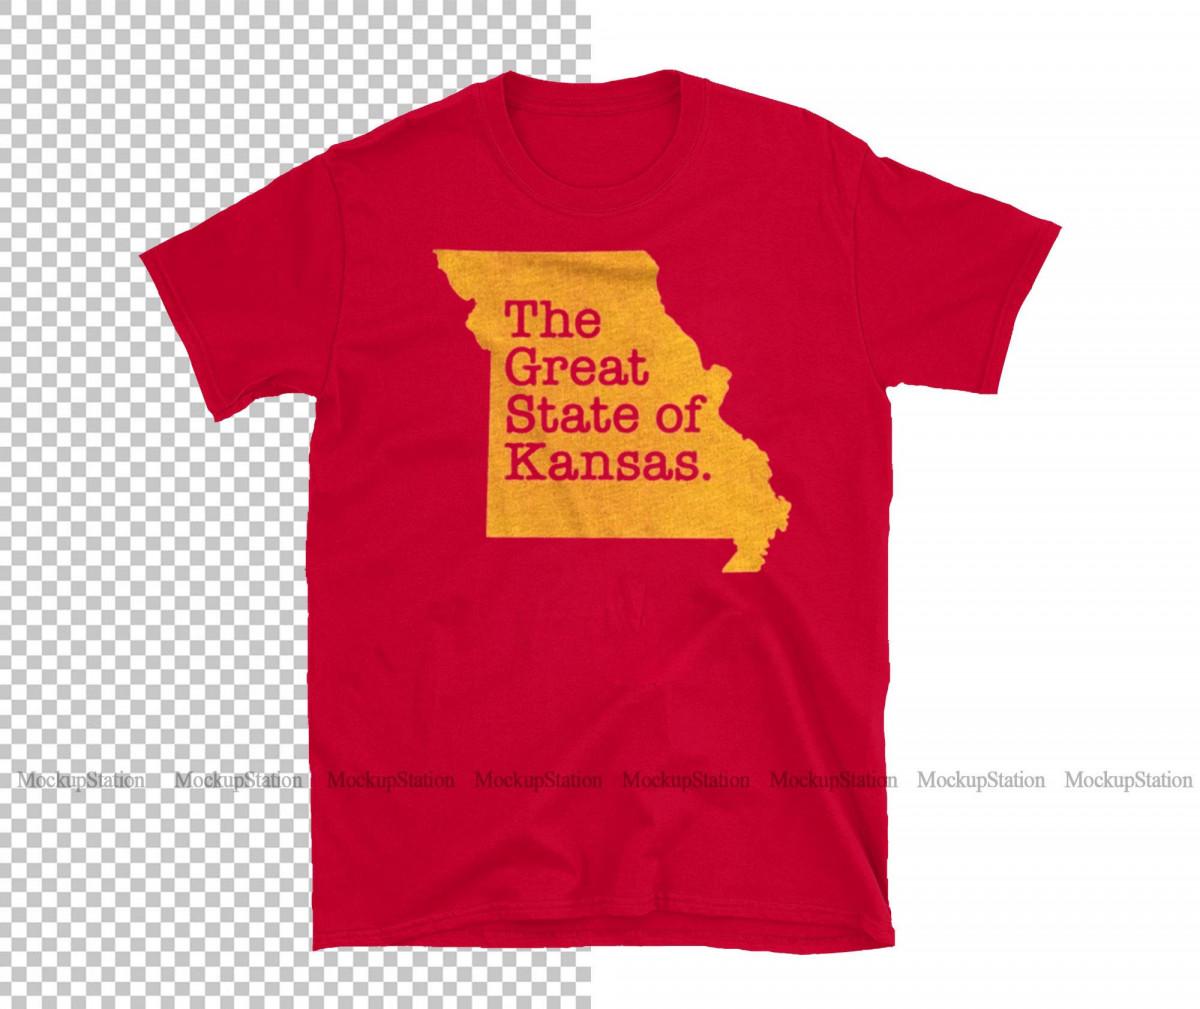 The Great State Of Kansas City Chiefs Super Bowl LIV Shirt